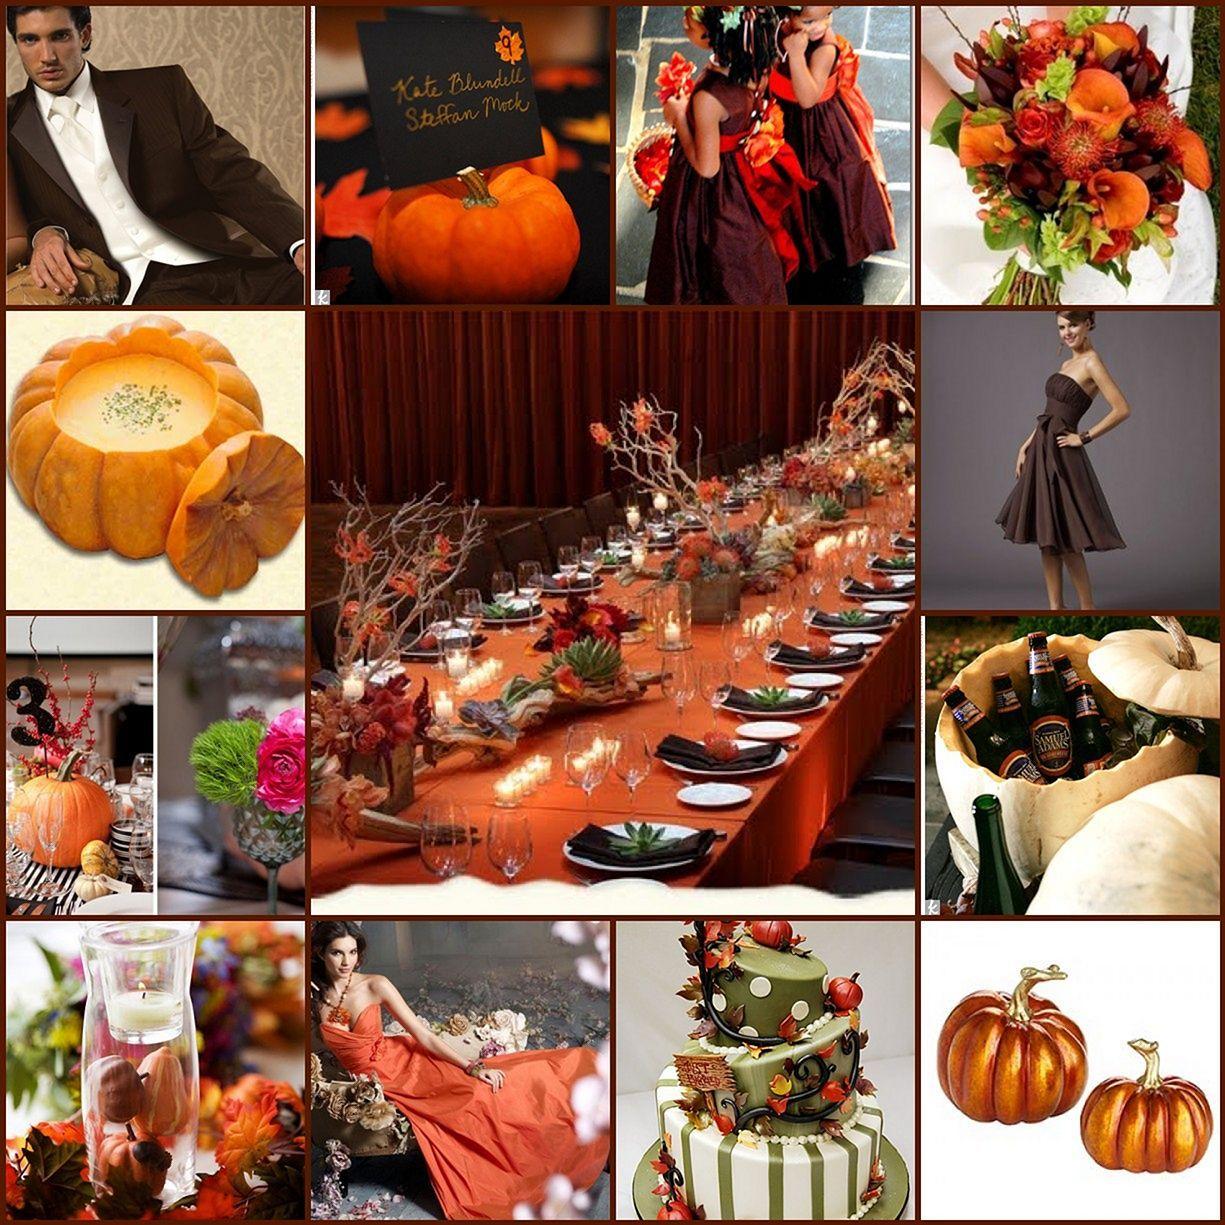 Fall wedding decor 2018  Top  Fall Wedding Theme  for Inspiration  House  Pinterest